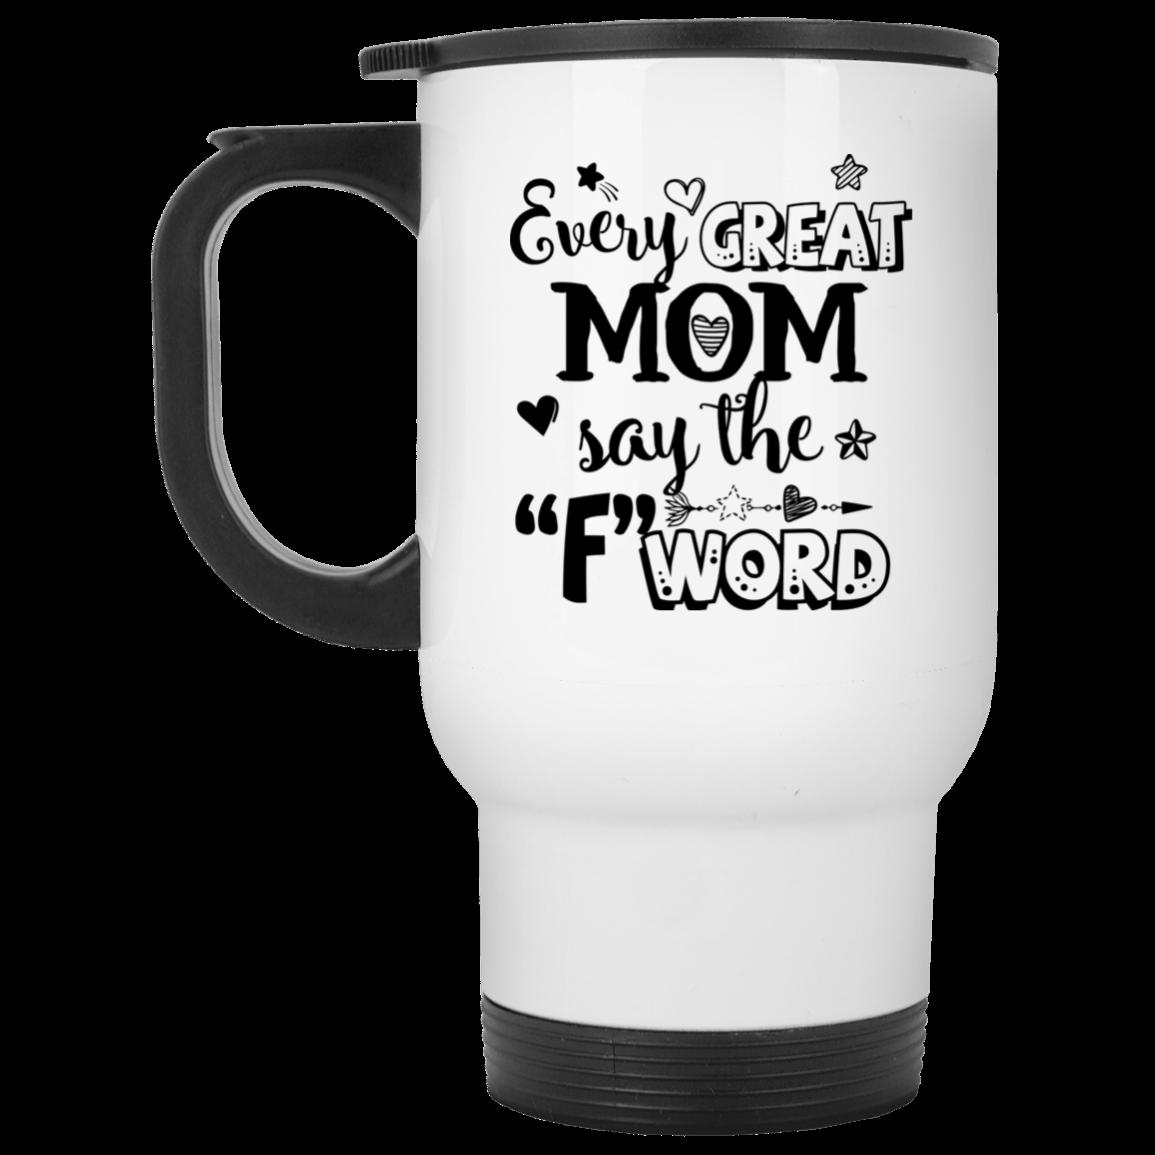 Novelty Birthday... Every Great Mom says the f word Coffee Mug Funny Cup